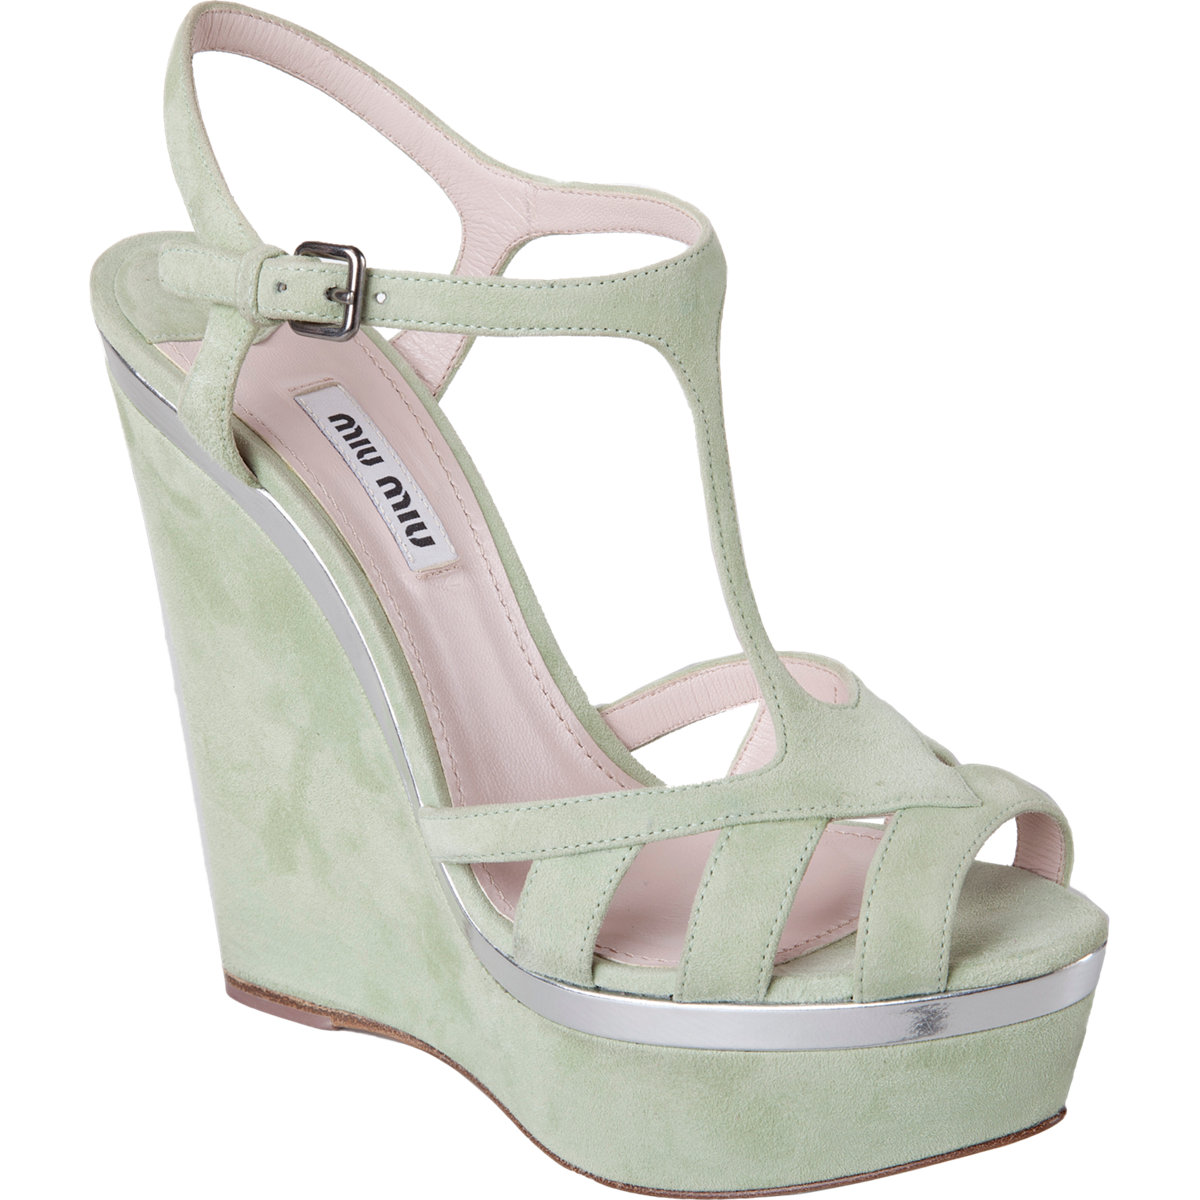 8c929d3217e9 Shoeniverse  MIU MIU Mint   Silver Tstrap Platform Wedge Sandal